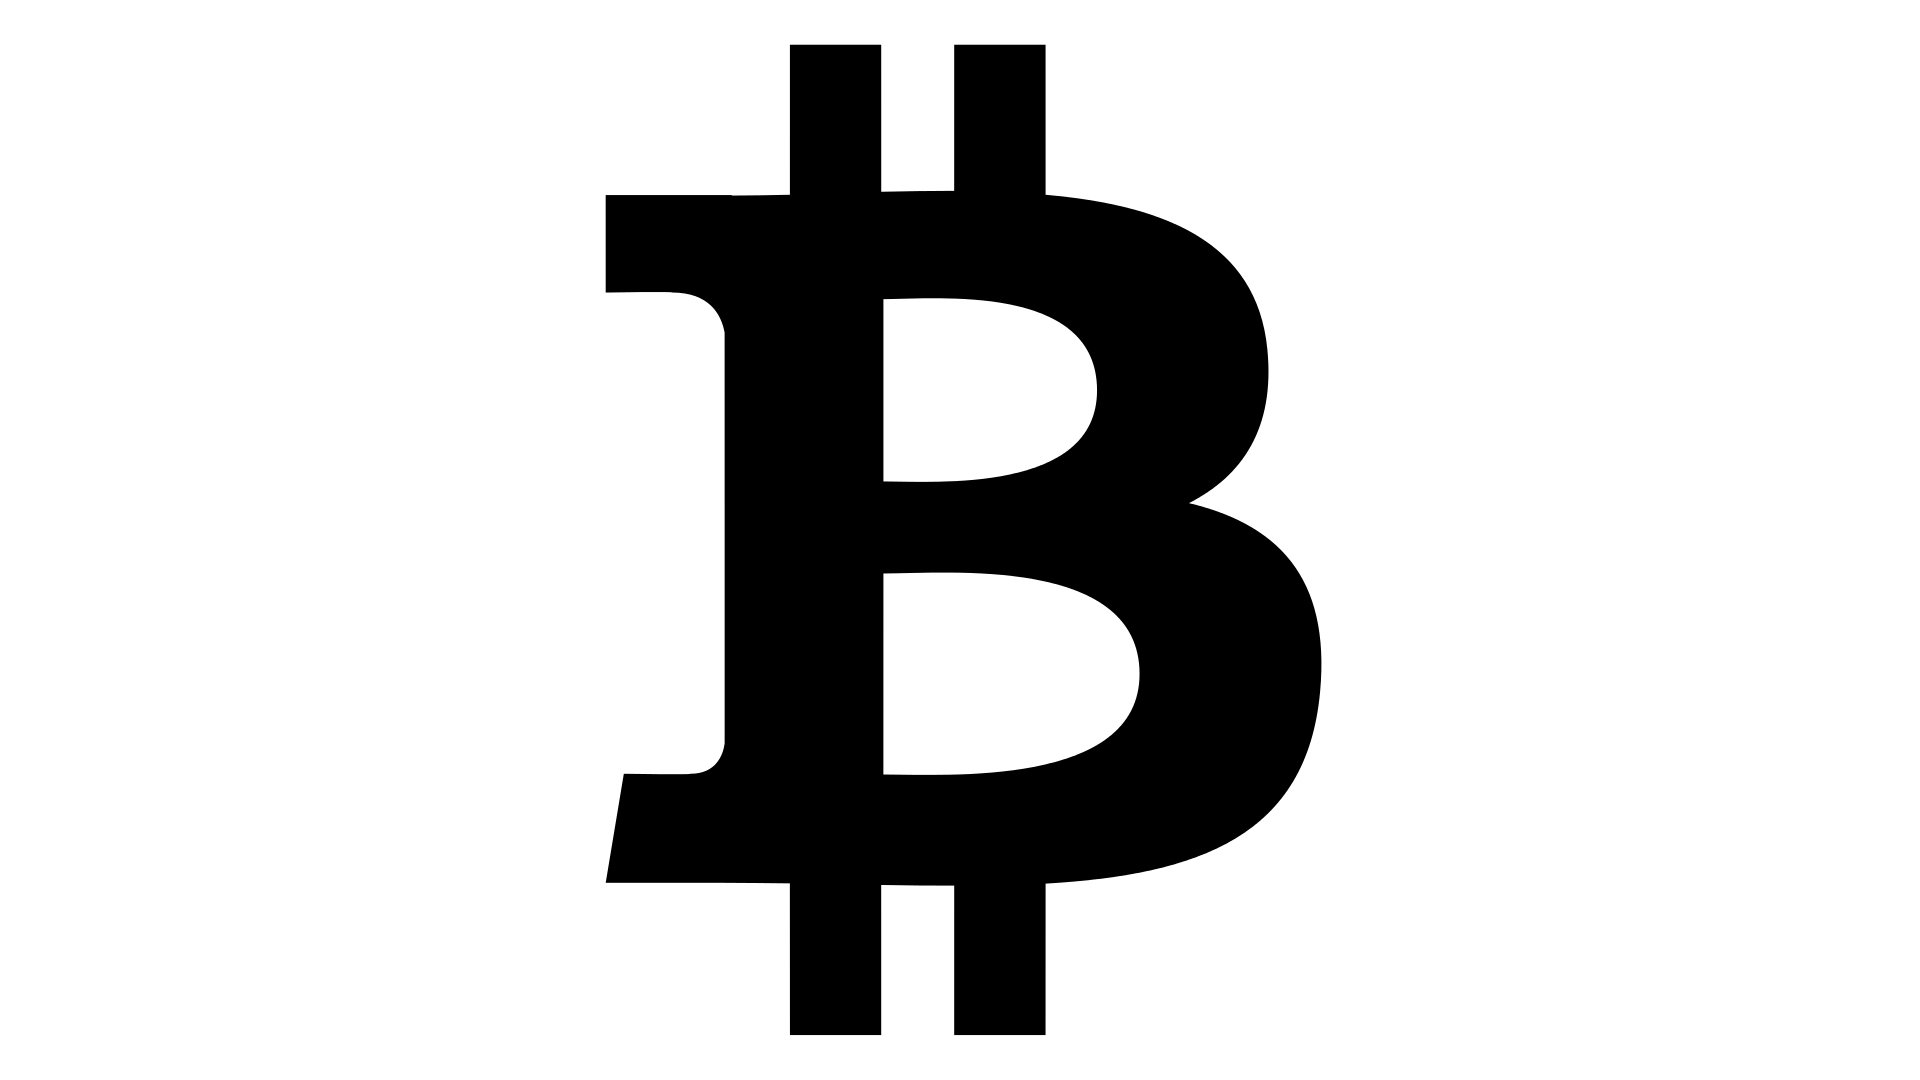 Bitcoin Logo Bitcoin Symbol Meaning History And Evolution